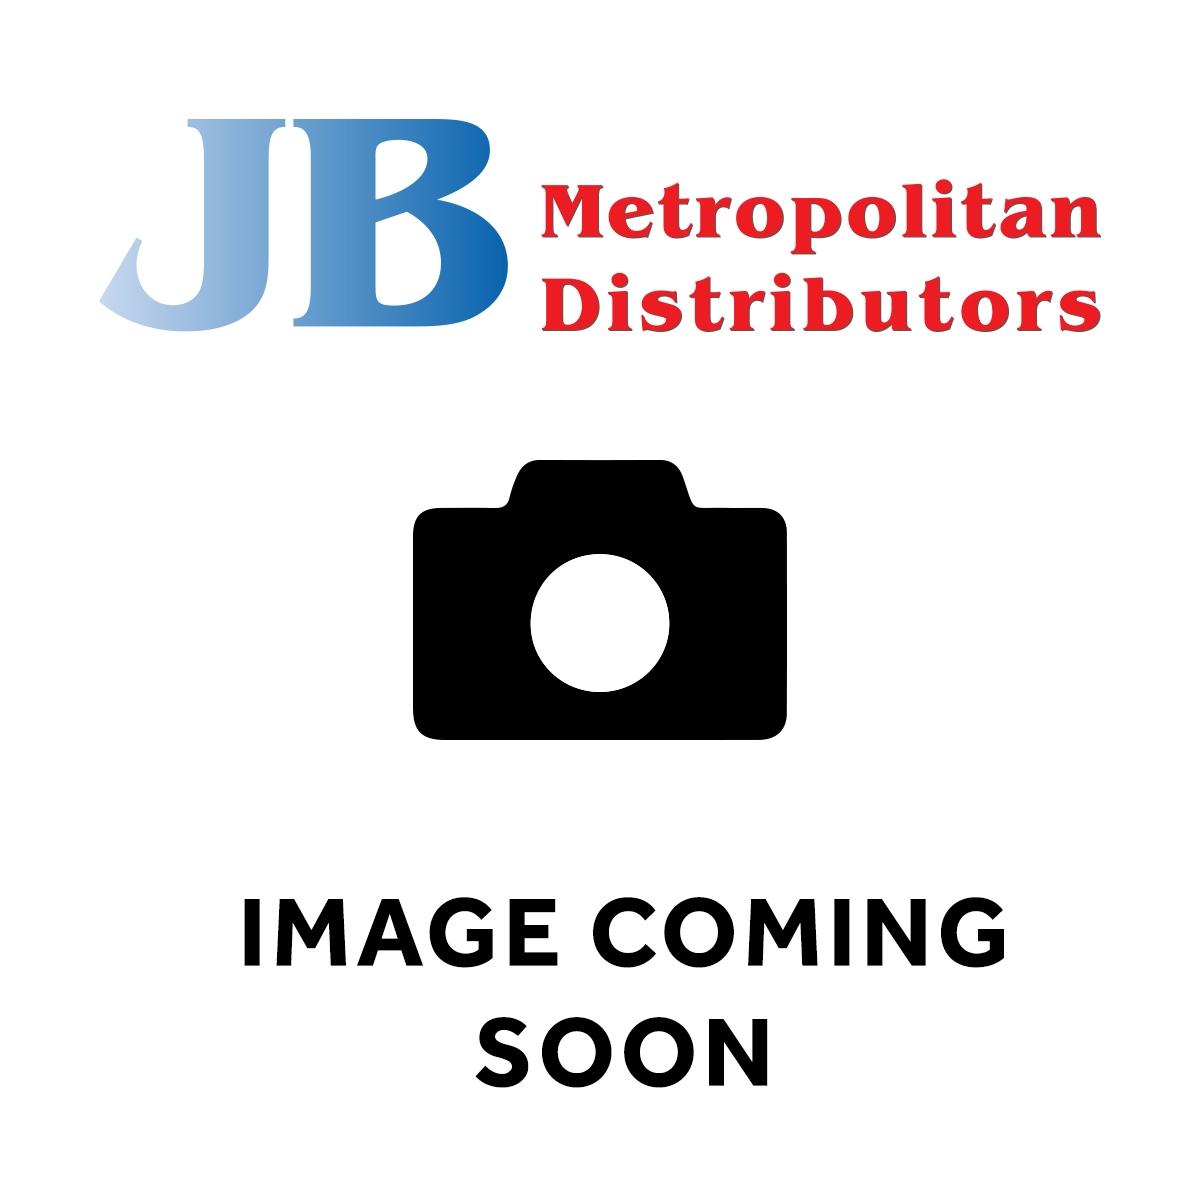 27.9G HALLS STICK MIX BERRY